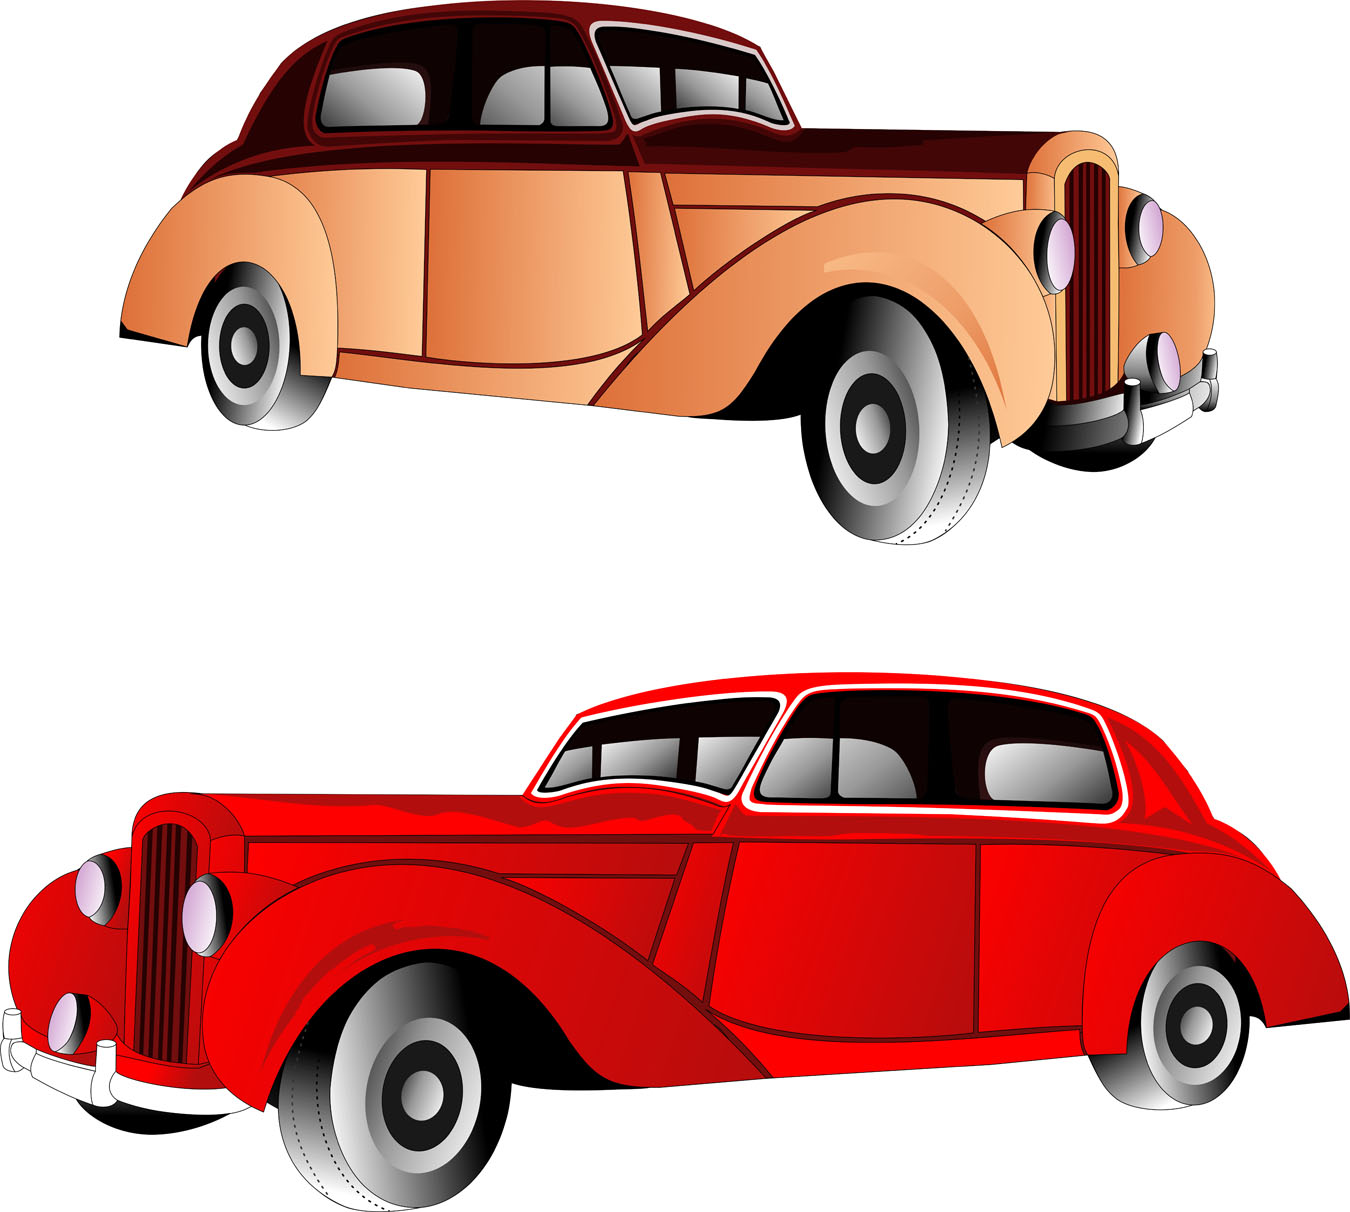 Vintag ecar clipart png free stock Antique Car Clipart | Free download best Antique Car Clipart on ... png free stock